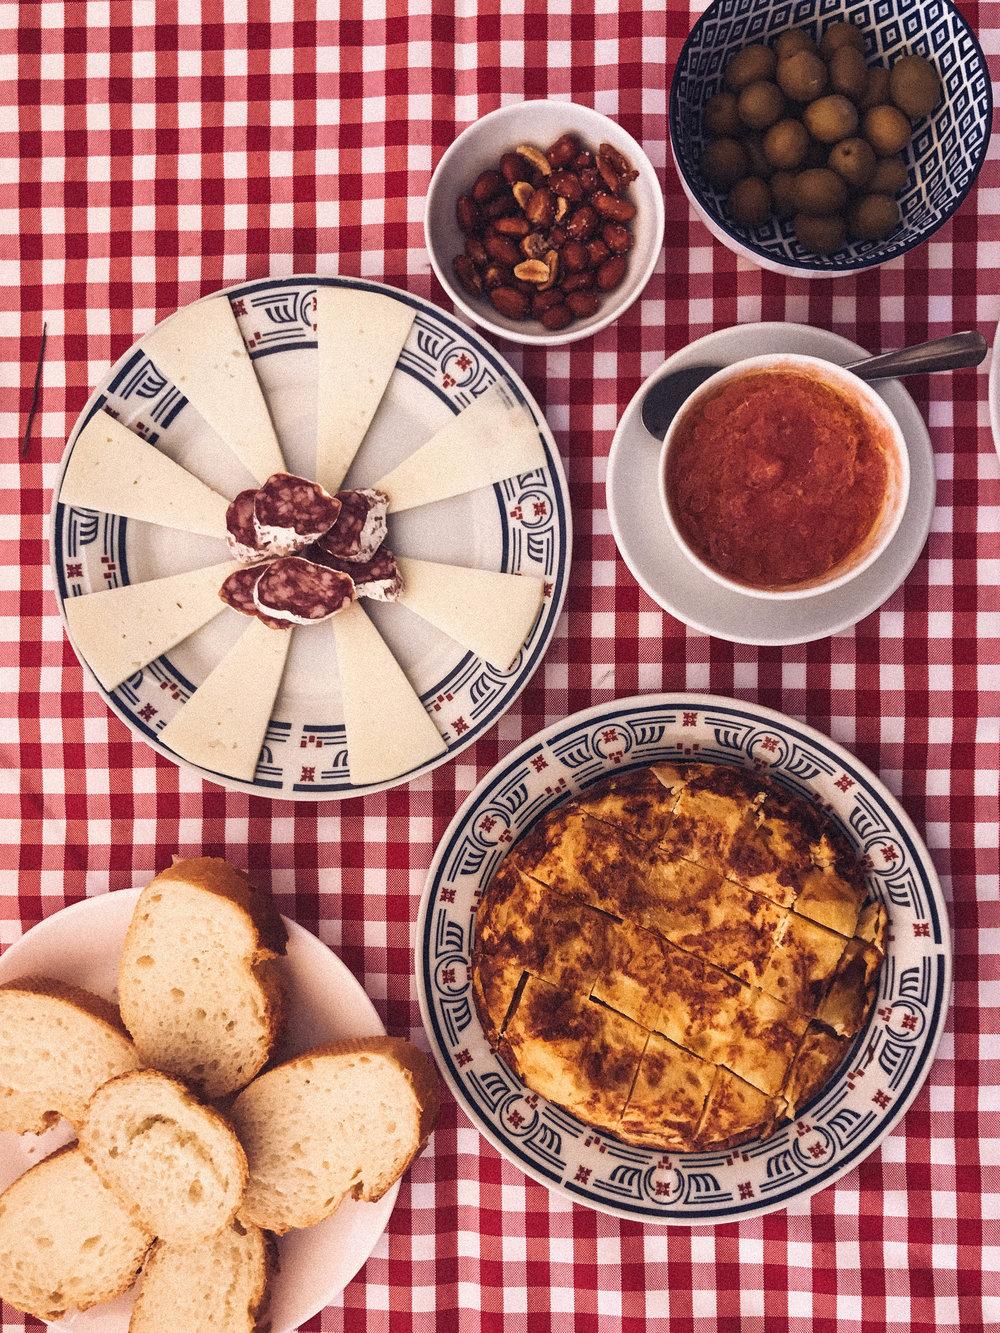 Cooking Paella in Sueca Valencia 7.jpg